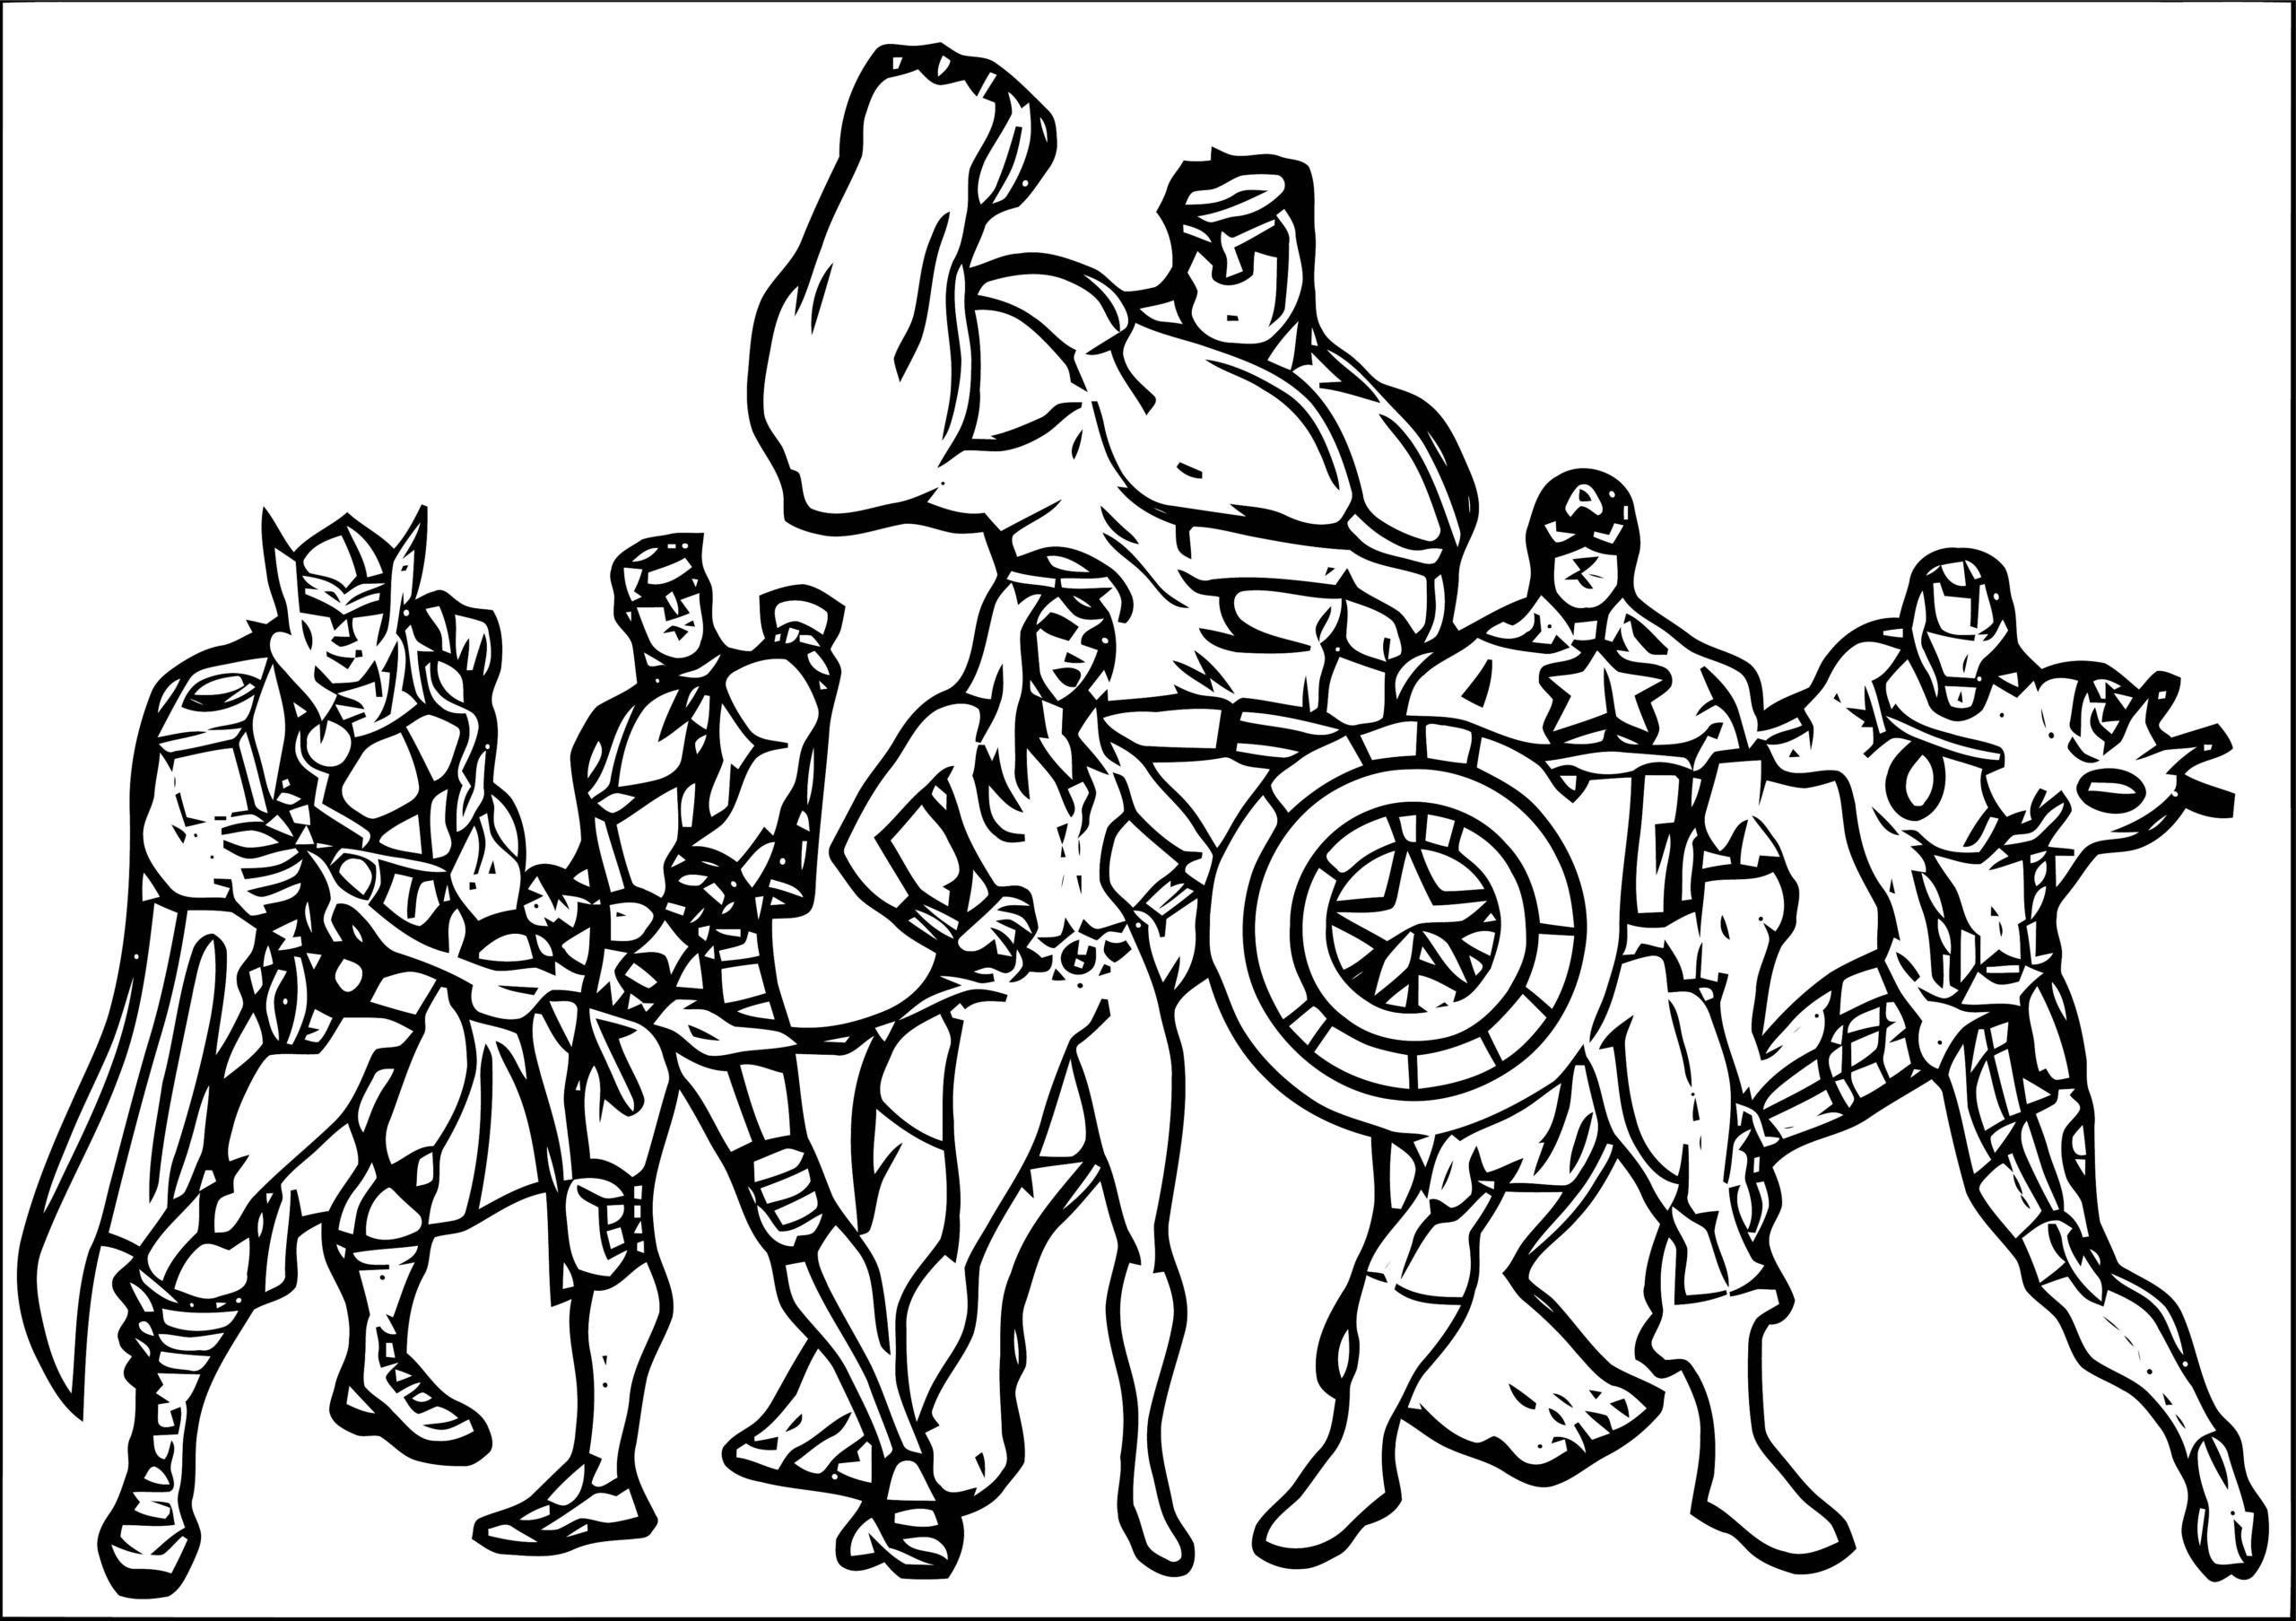 16 Avengers Colouring In Printable In 2021 Avengers Coloring Avengers Coloring Pages Lego Coloring Pages